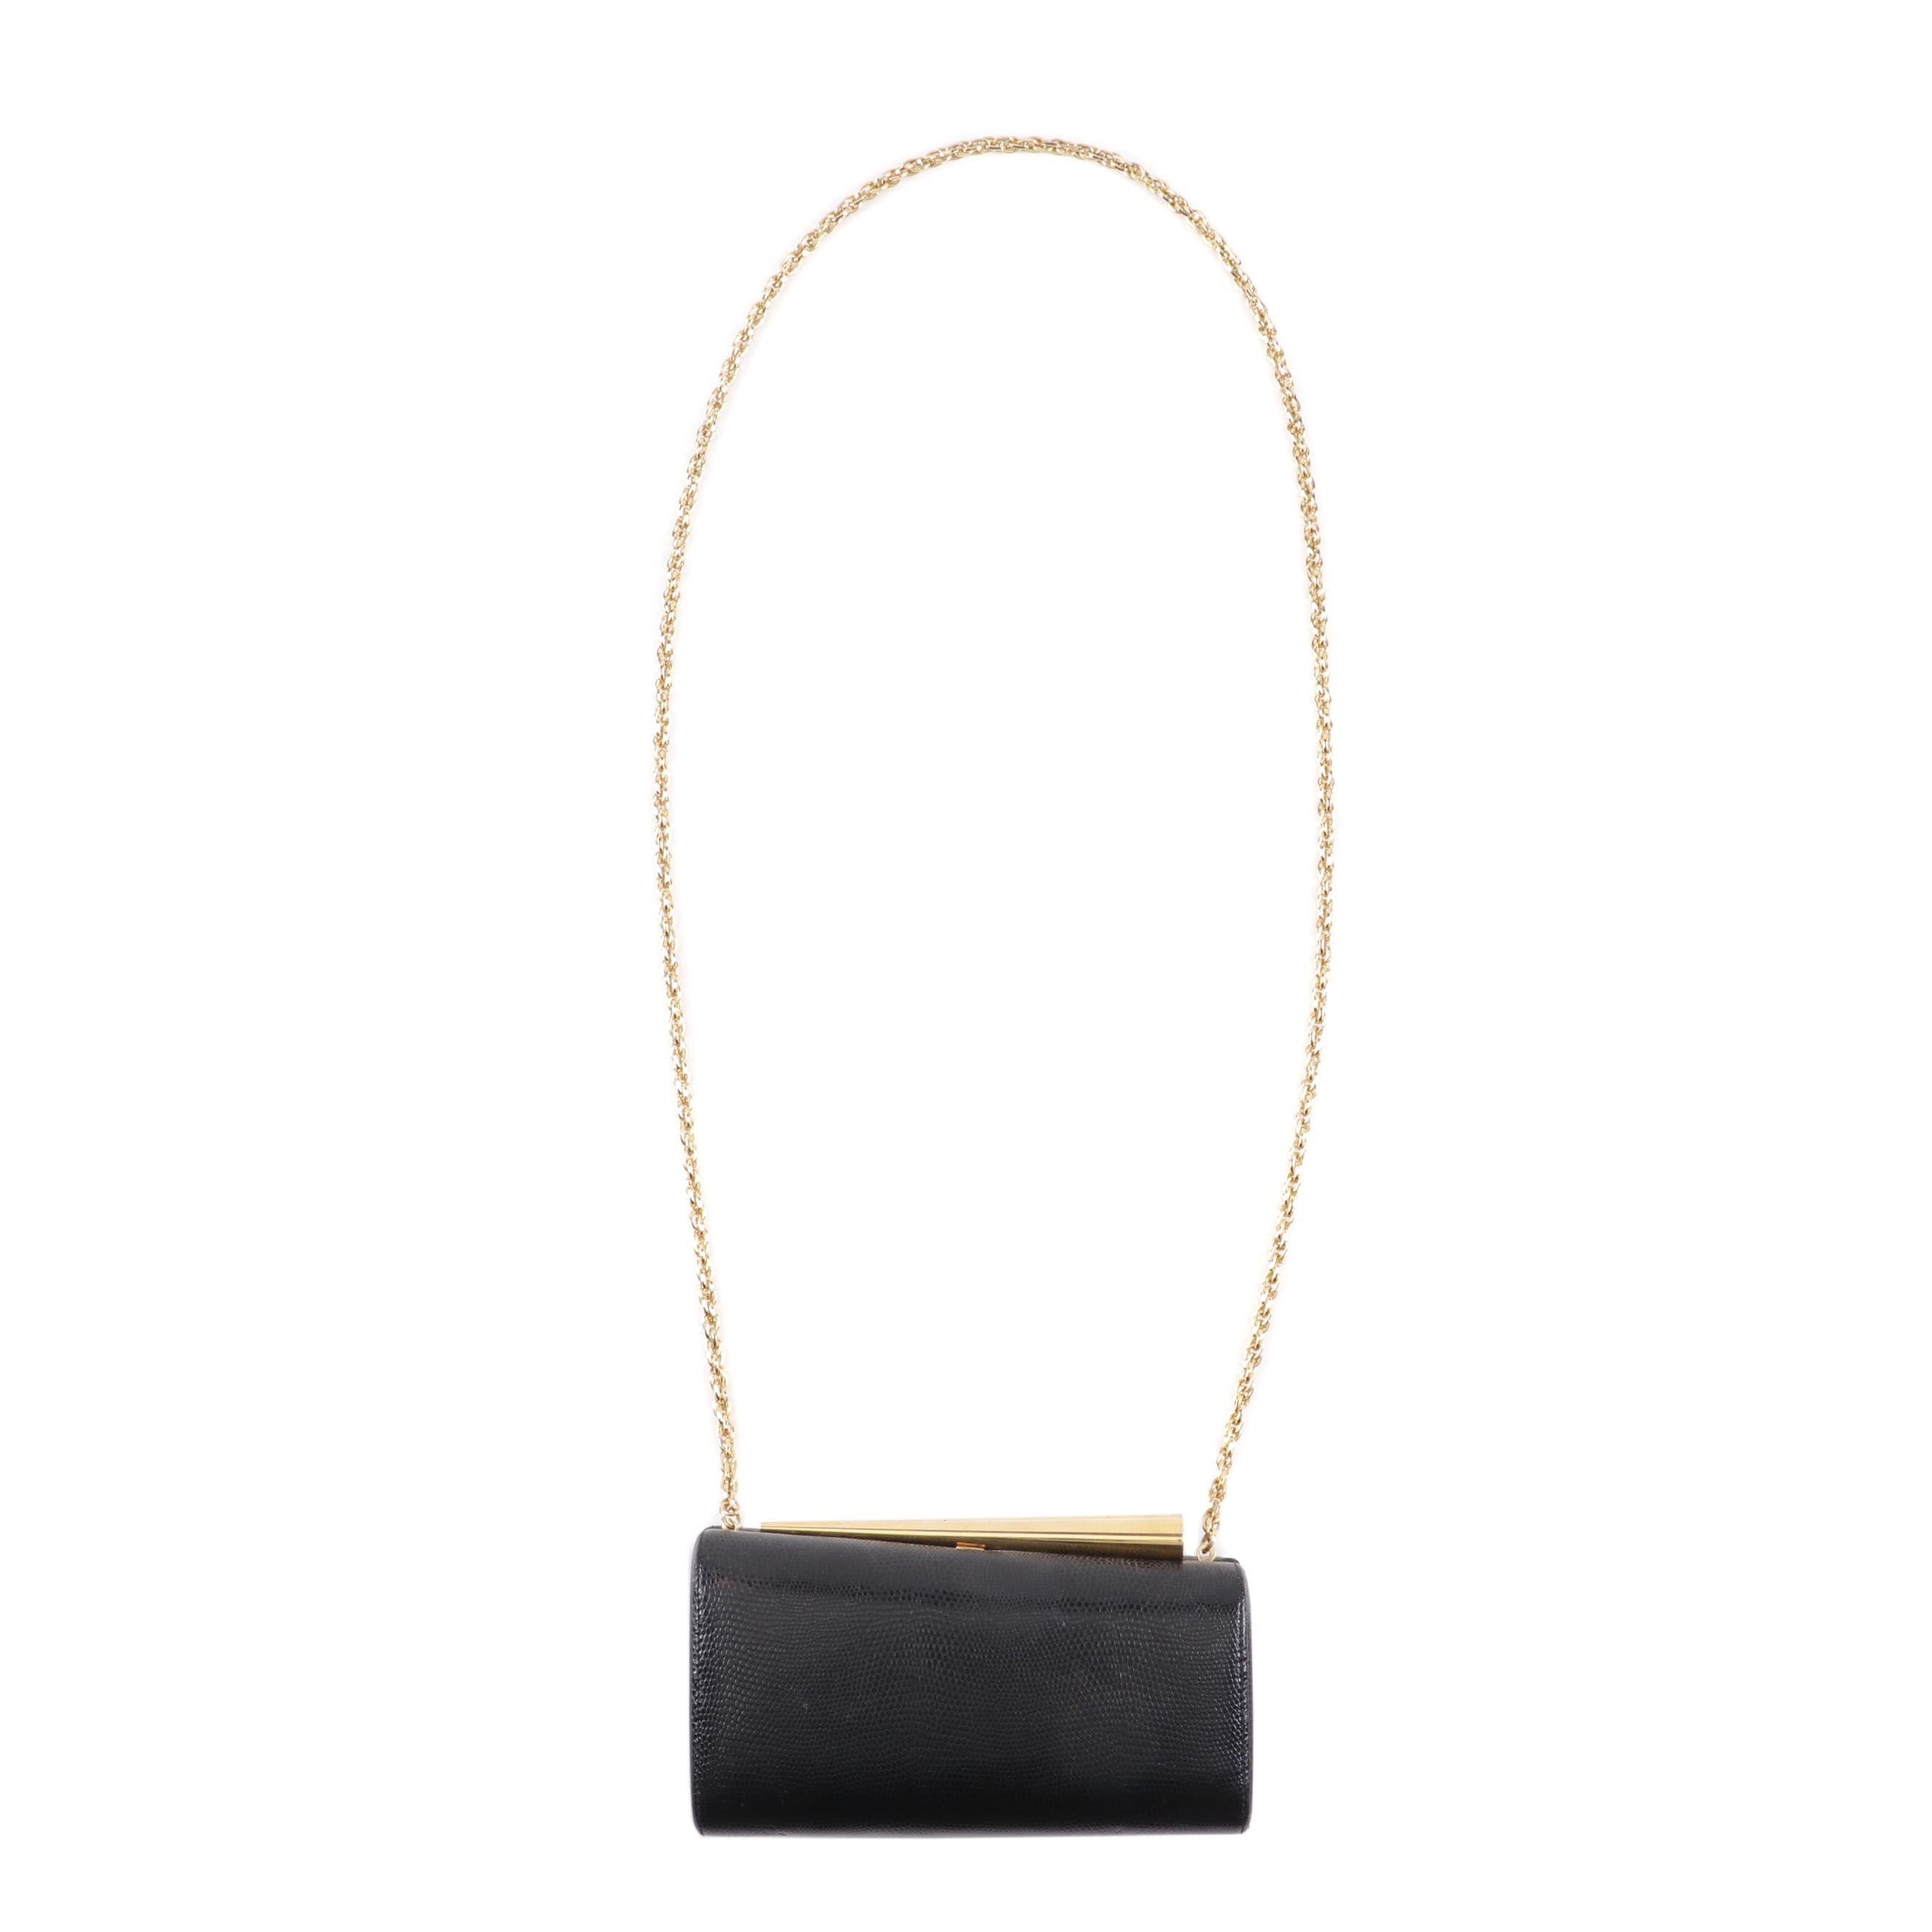 Rodo Lizard Embossed Black Leather Chain Strap Shoulder Bag